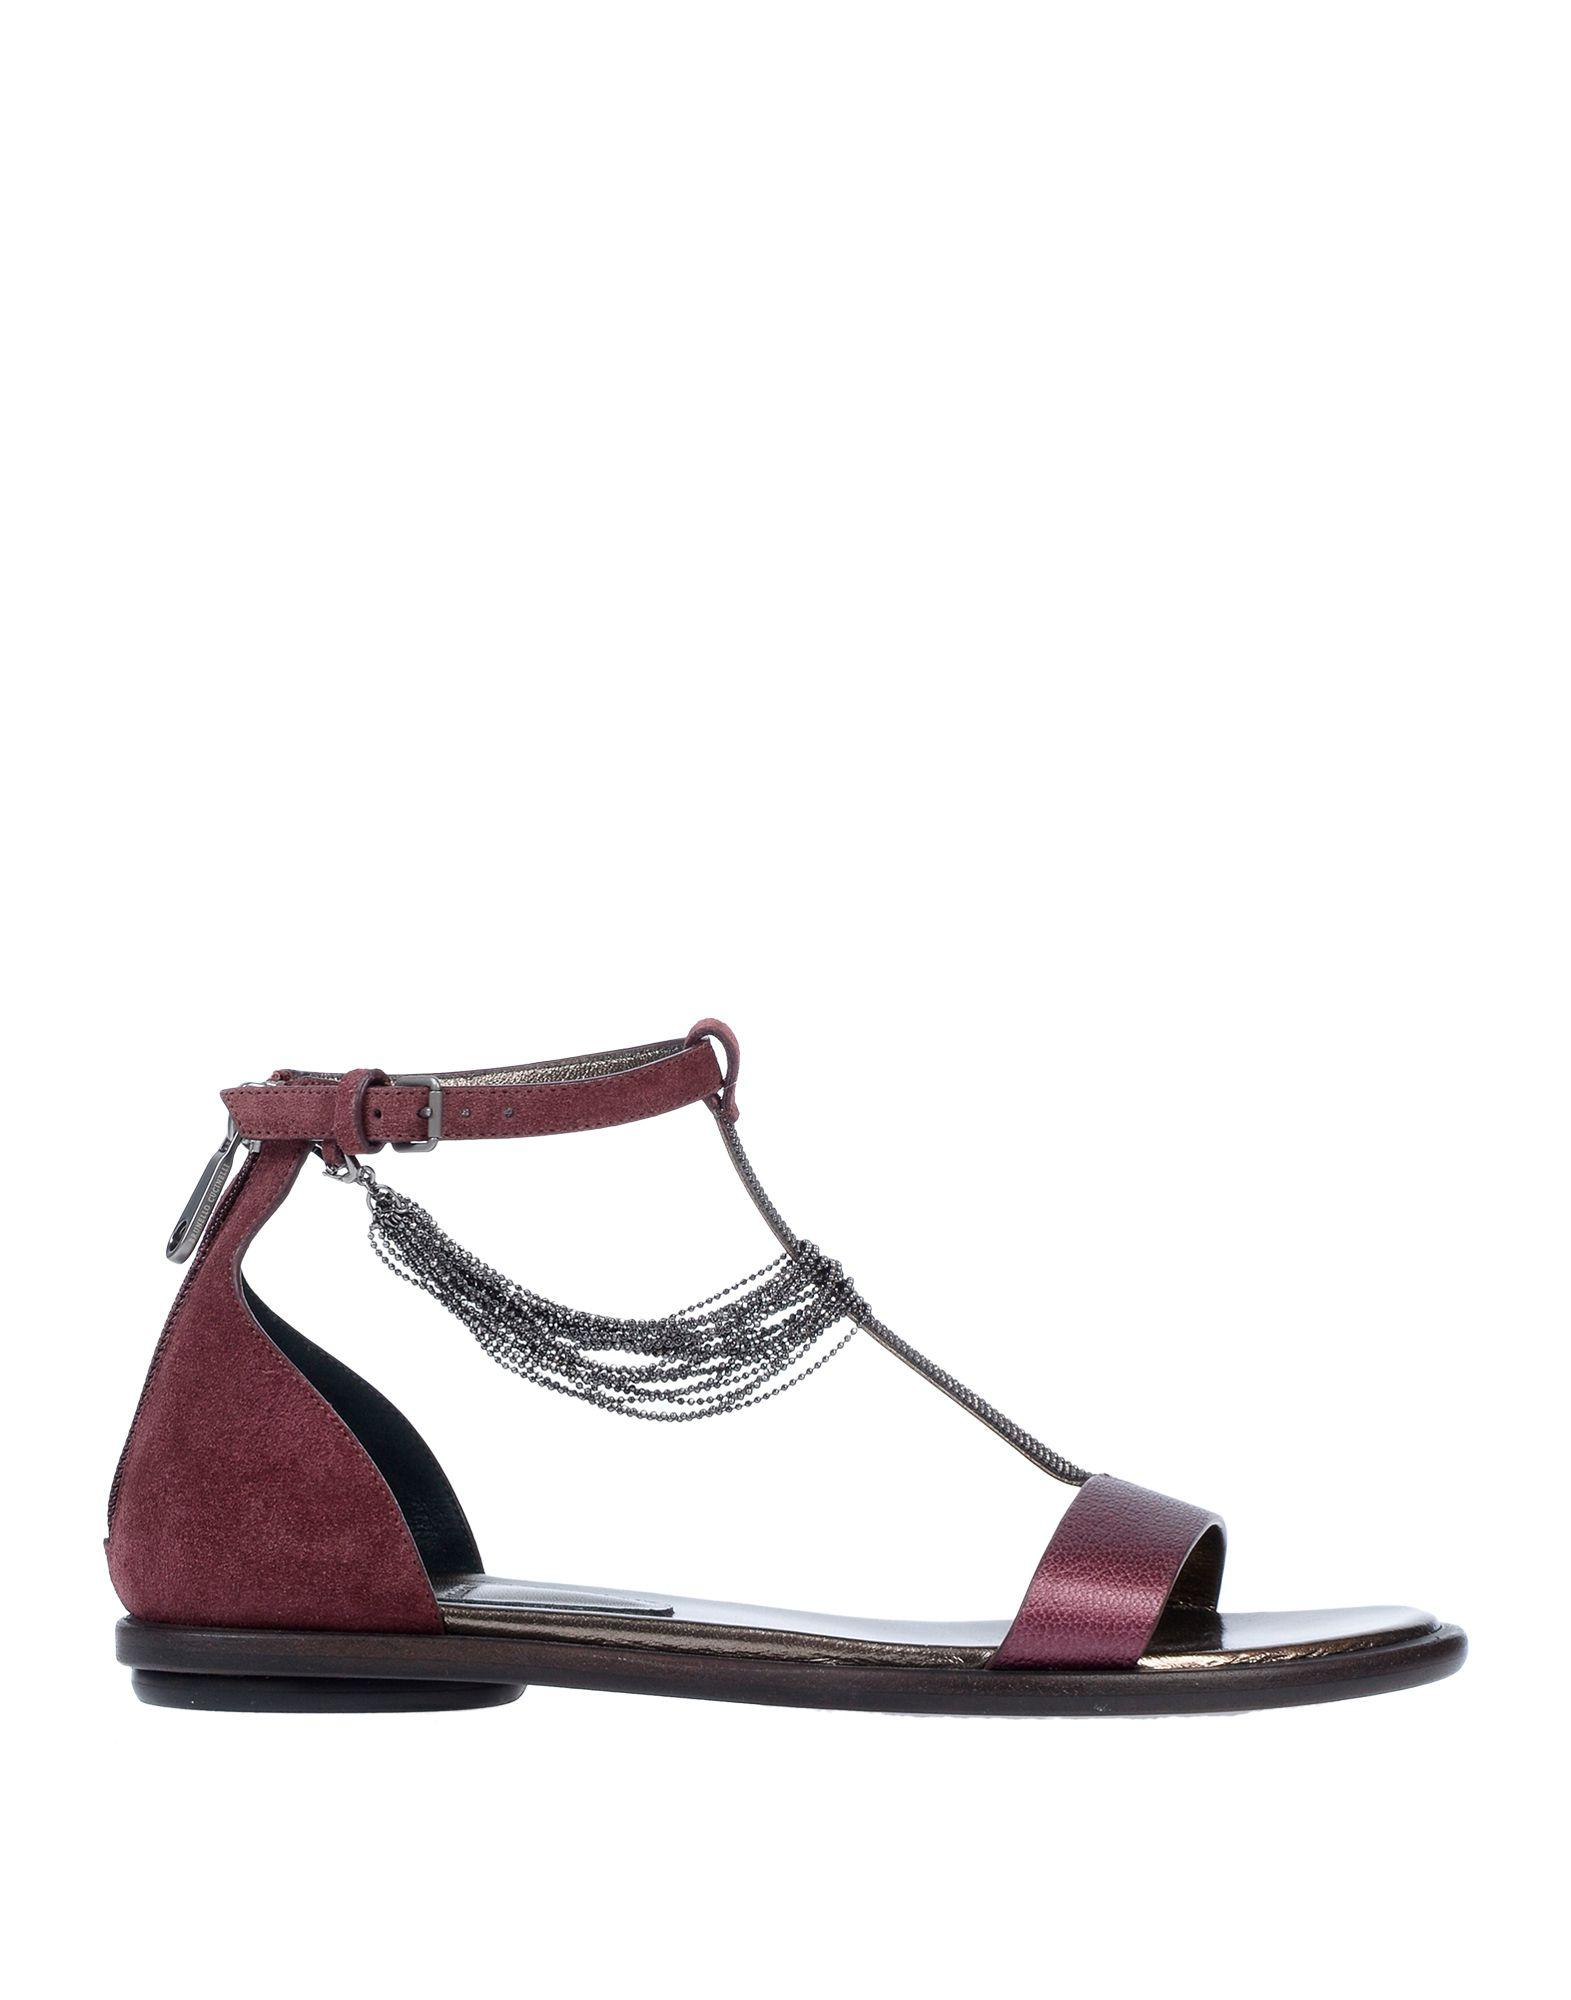 f43d22055db Lyst - Brunello Cucinelli Sandals in Purple